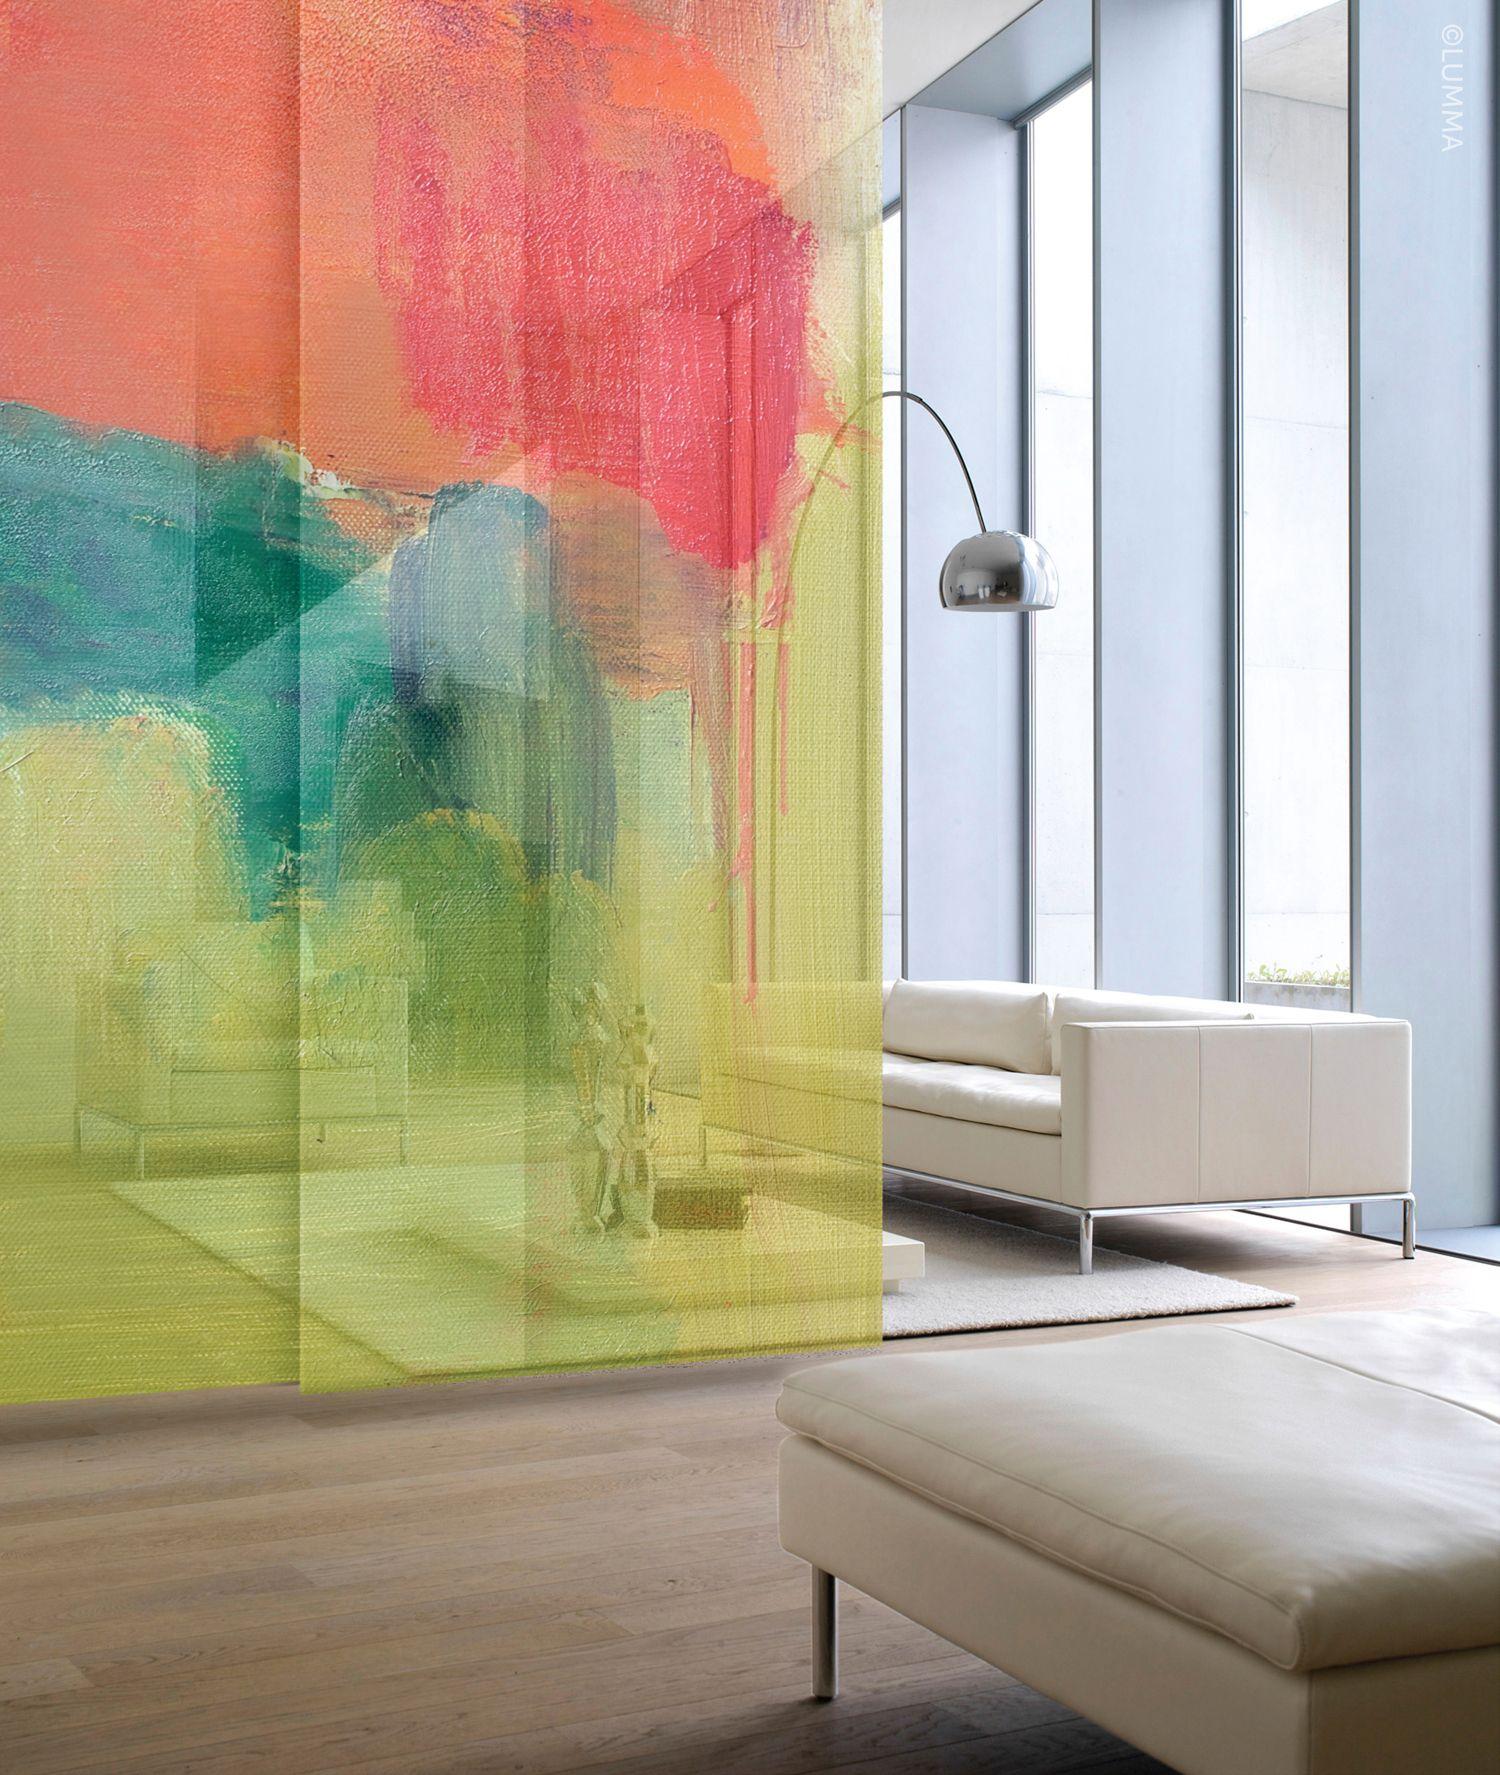 LUMMA Floating Murals: Living | Art Installations | Pinterest | Art ...